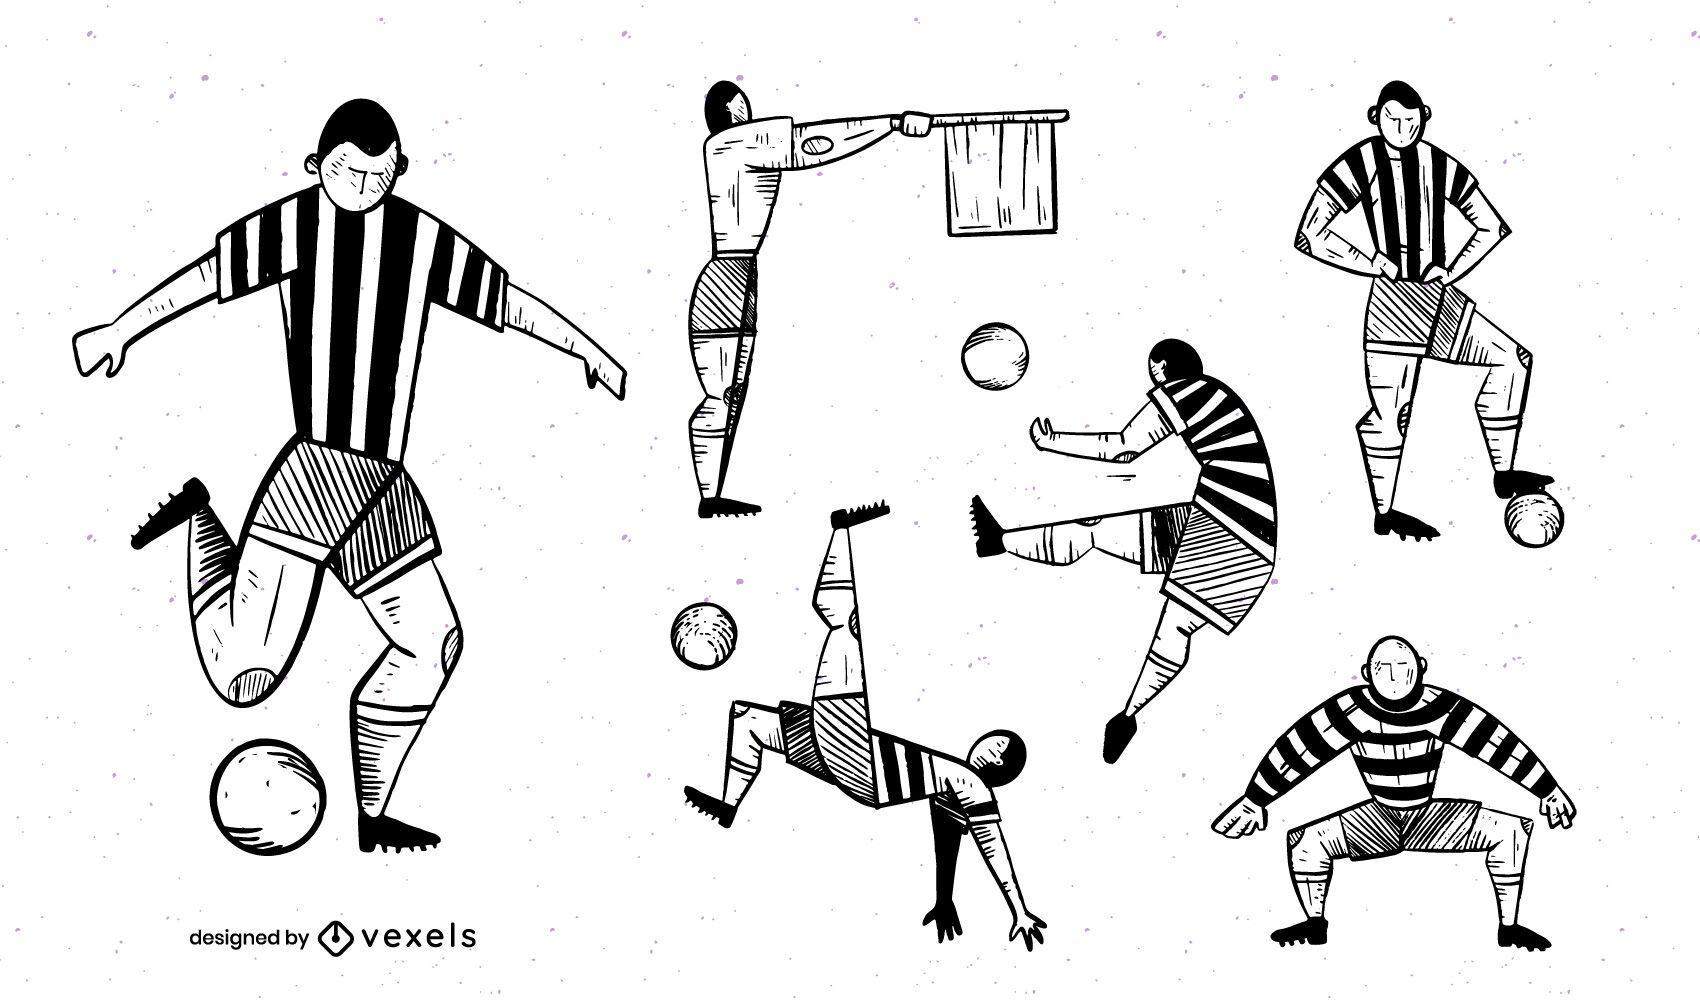 Monochrome Football Player Design Pack